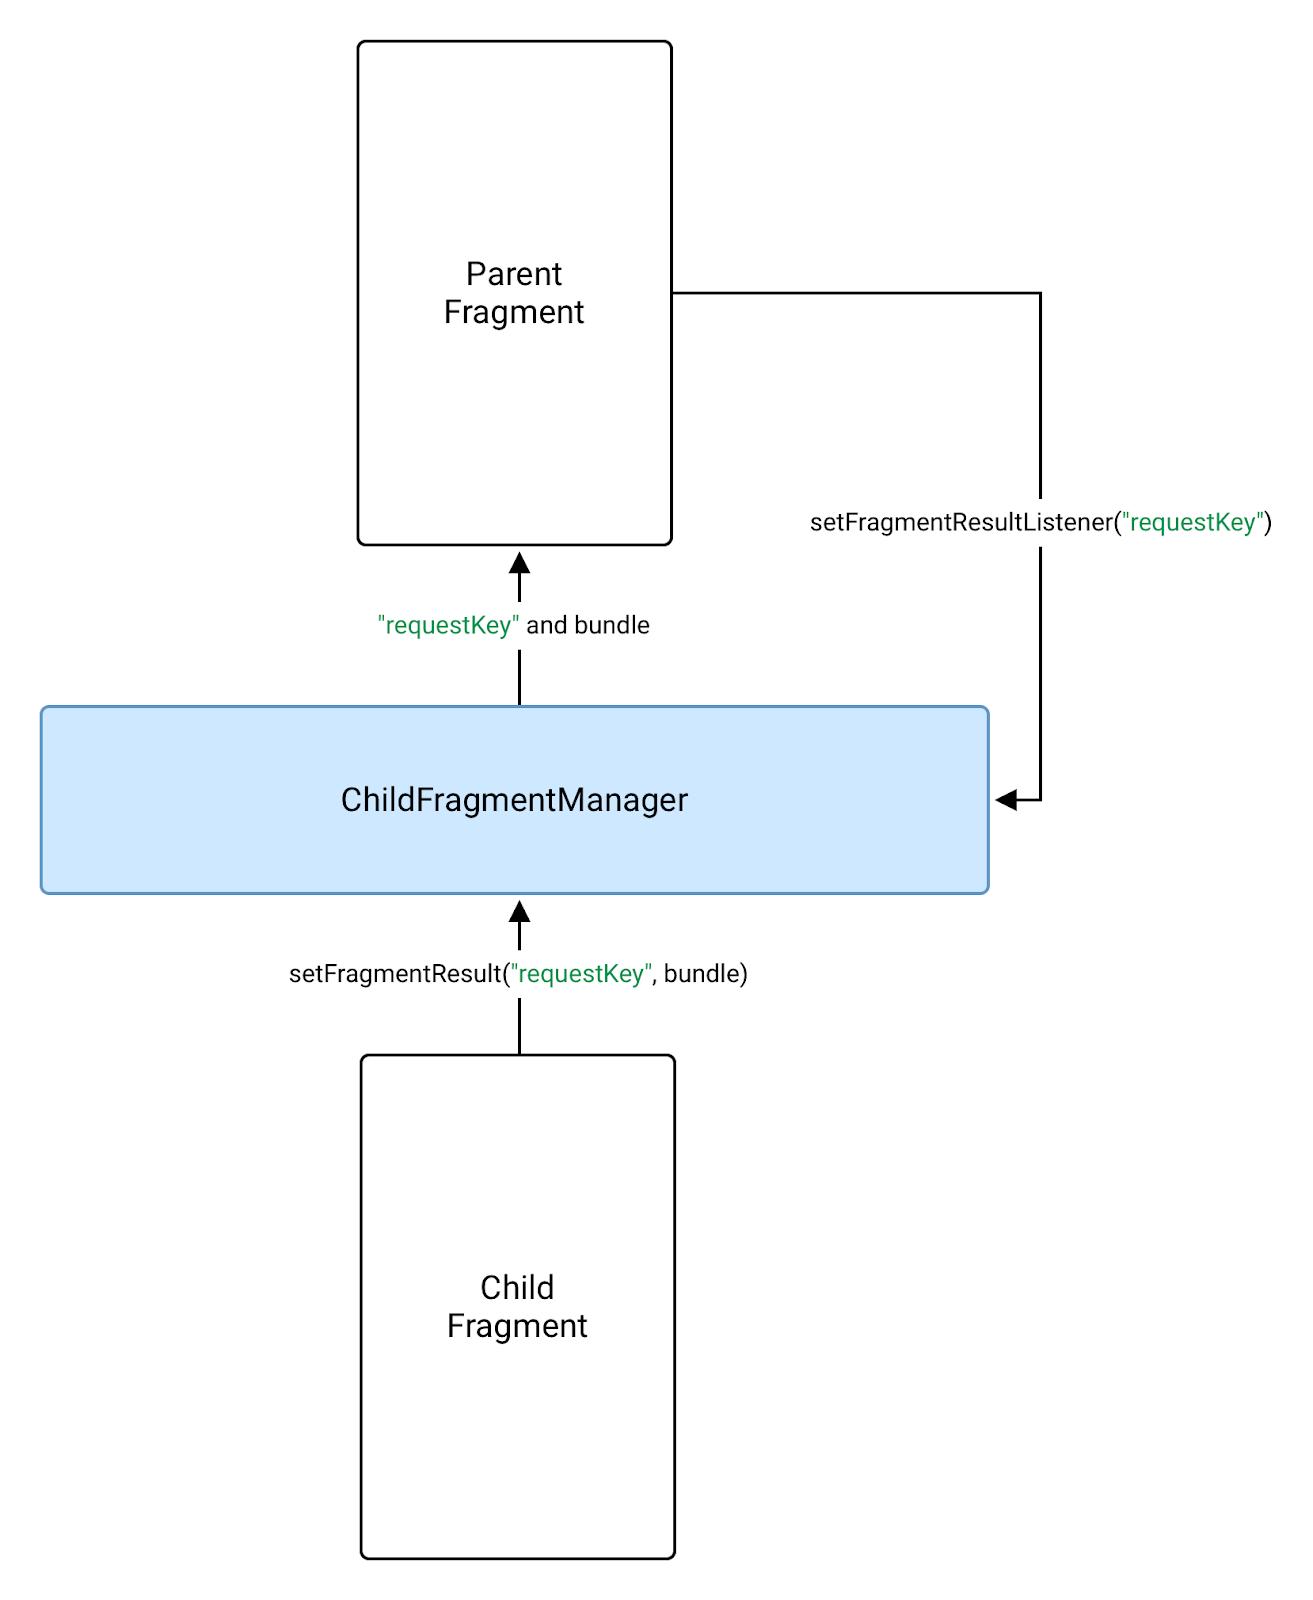 Un fragmento secundario puede usar FragmentManager para enviar un resultado a su superior